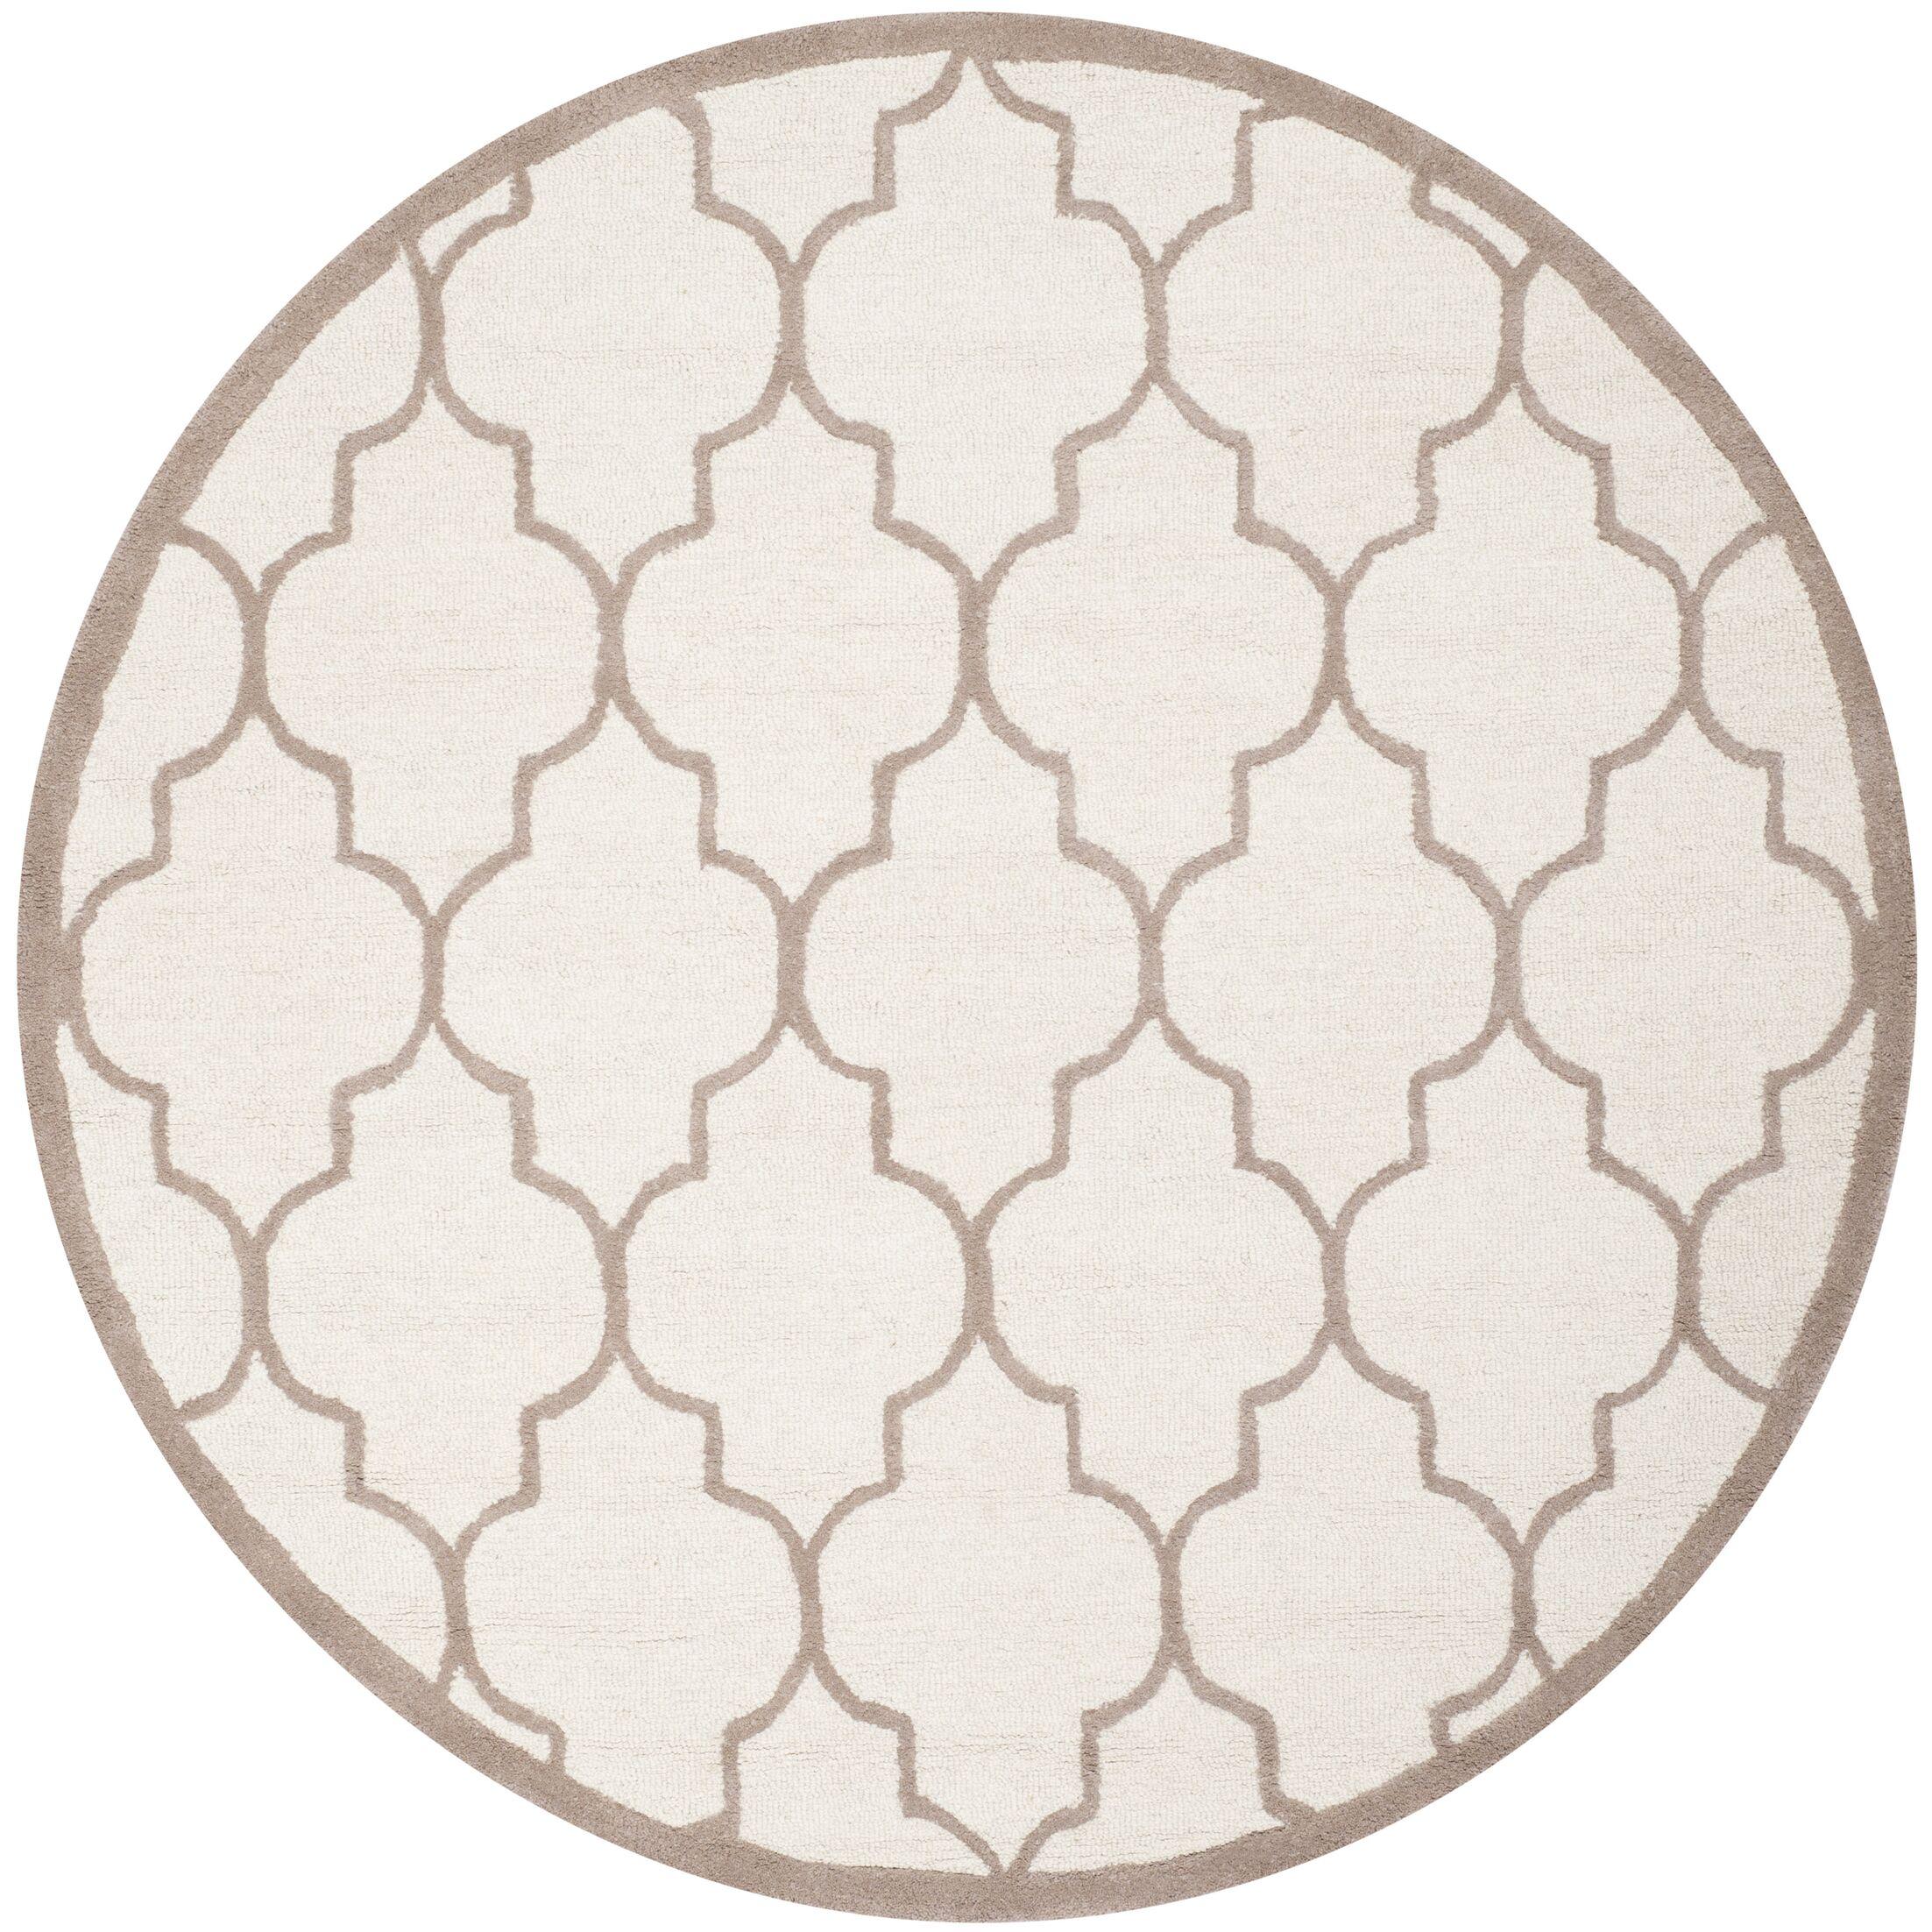 Charlenne Hand-Tufted Ivory/Beige Area Rug Rug Size: Round 6'